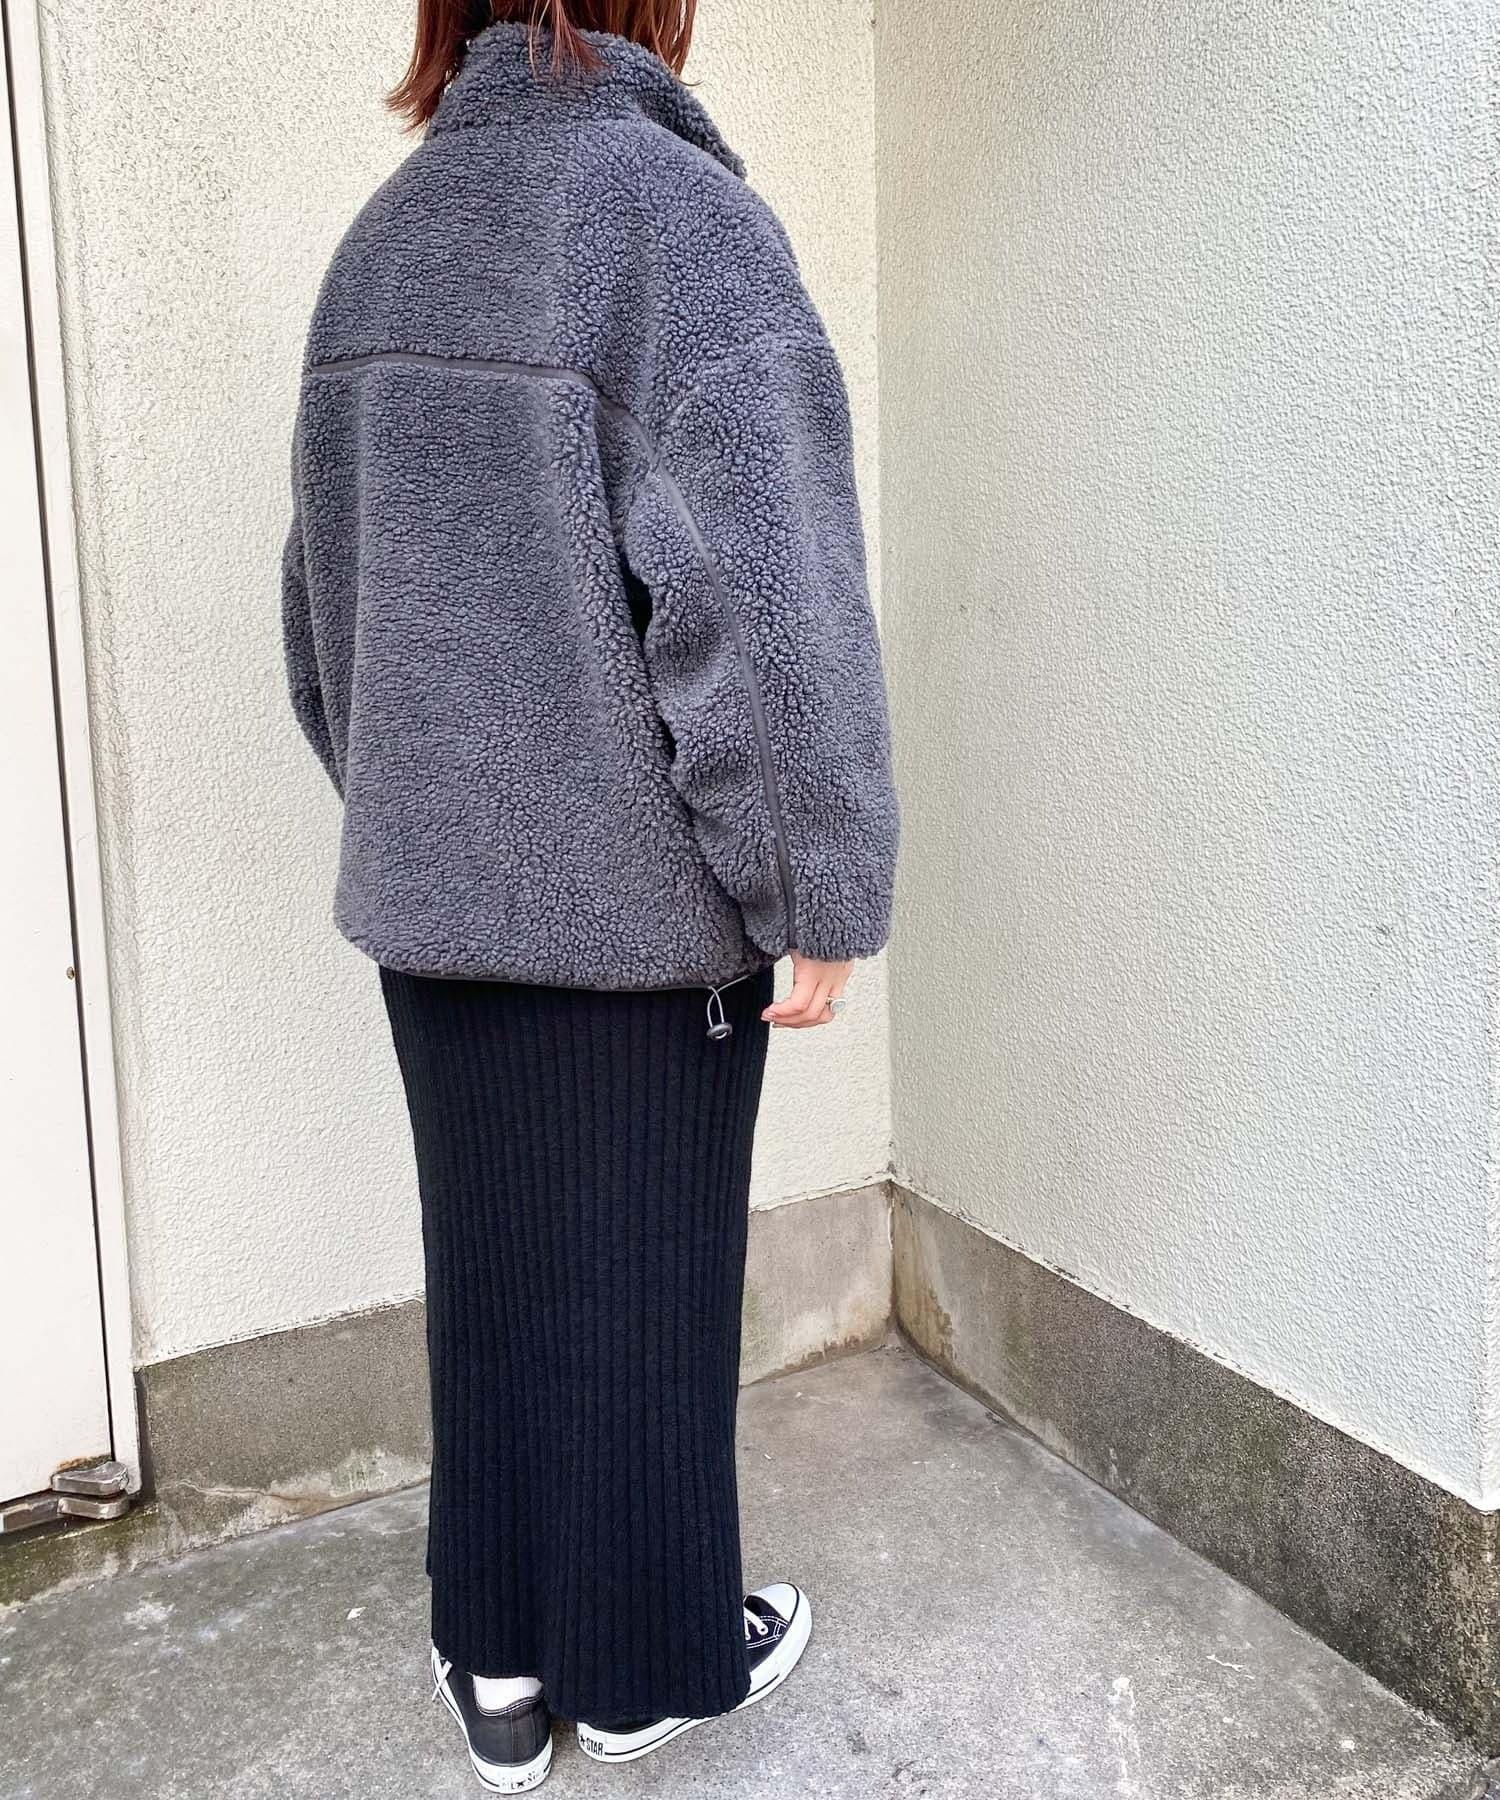 CIAOPANIC TYPY(チャオパニックティピー) 【OSORO】パイピングボアジャケット